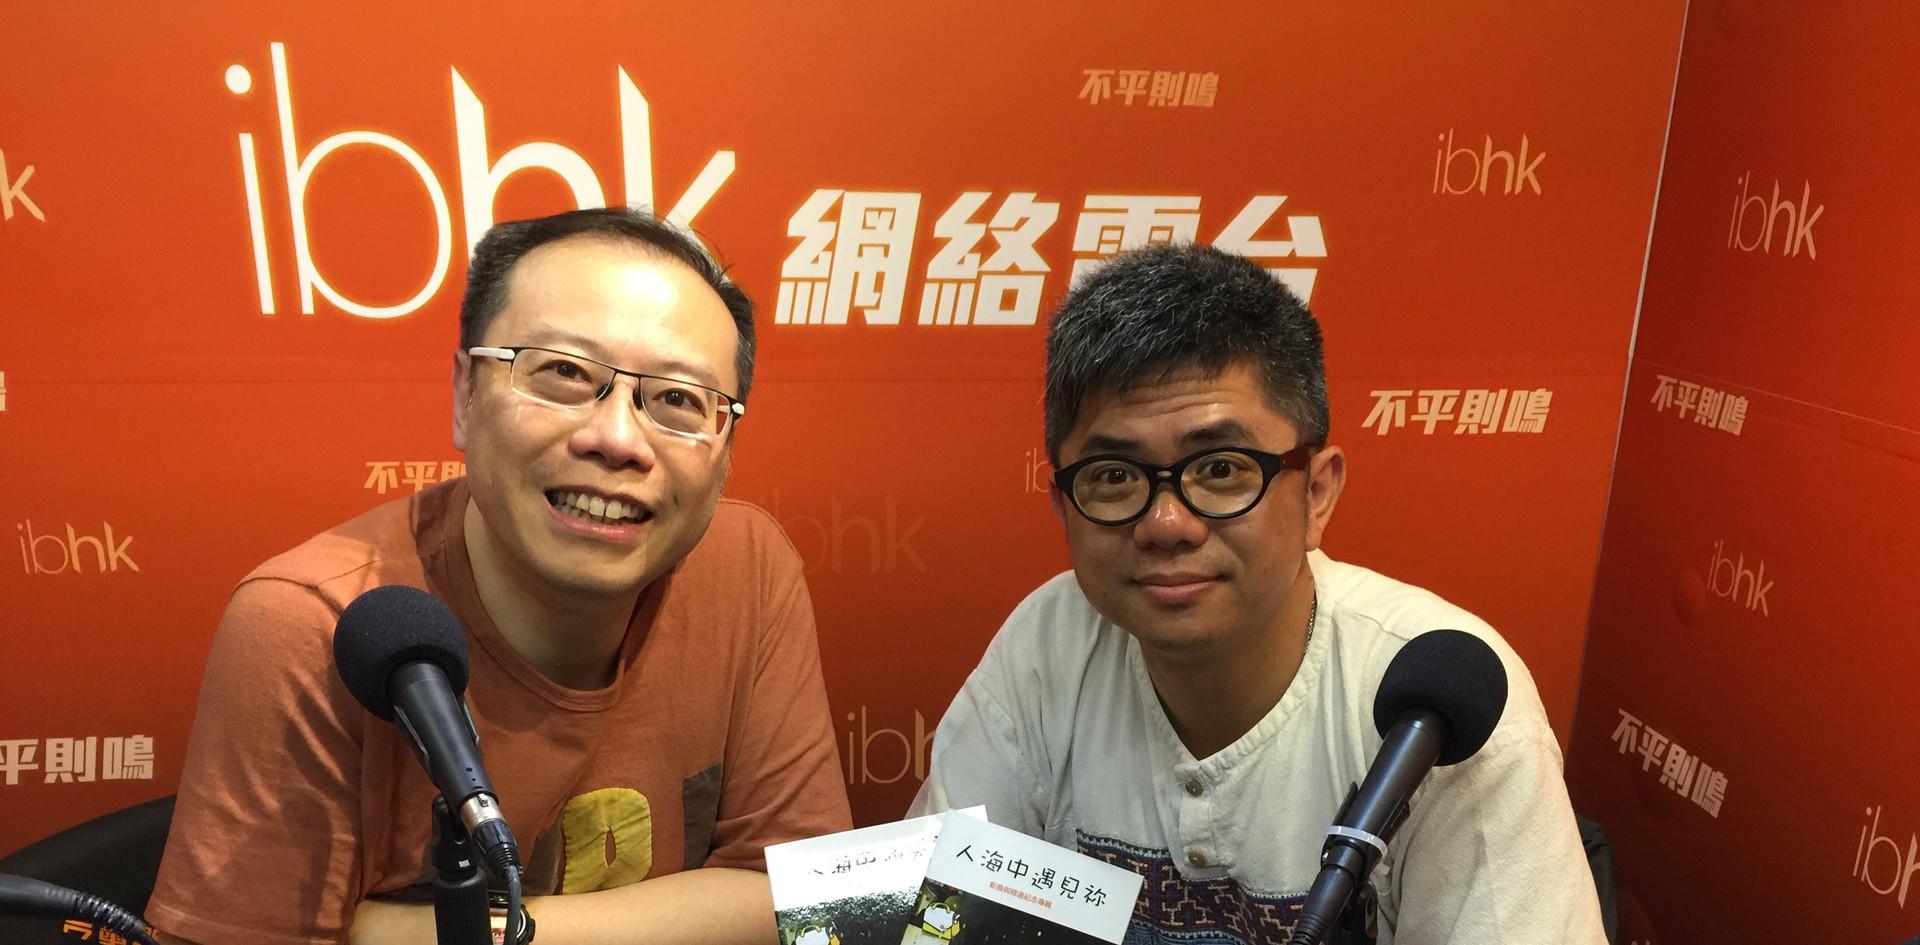 IBHK net radio